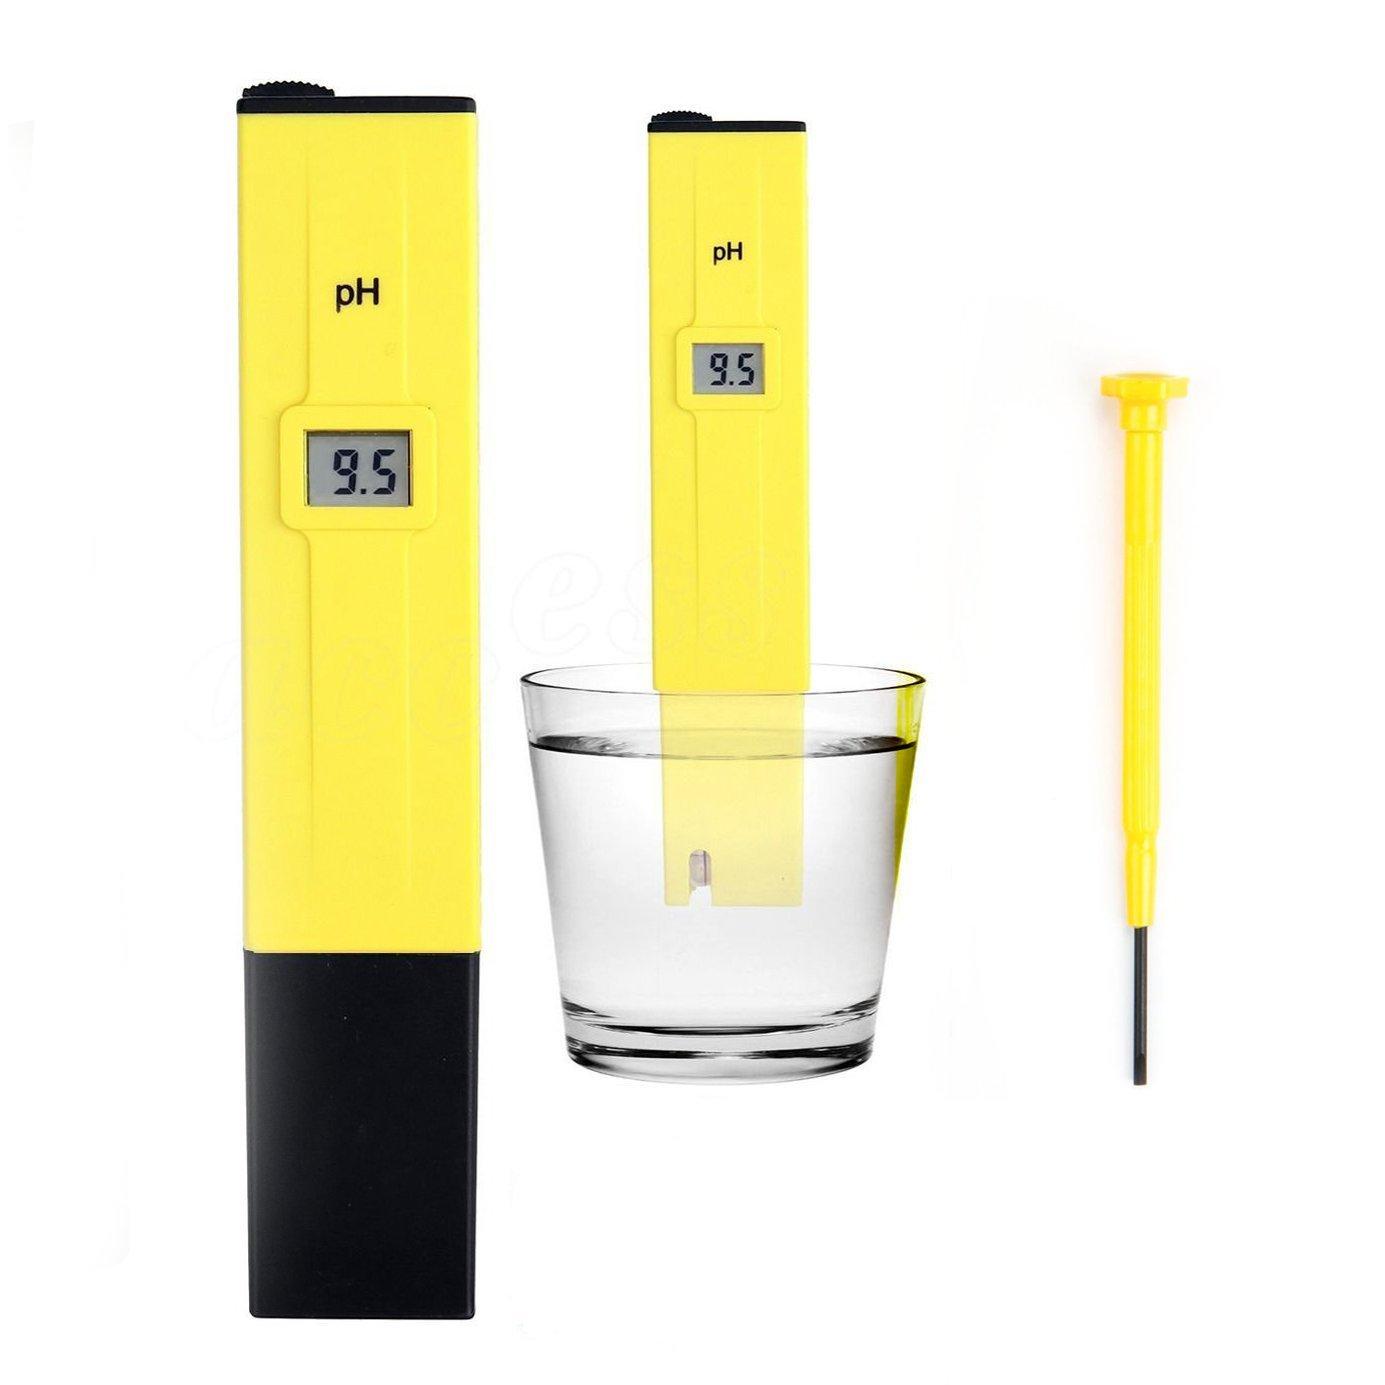 UZZO 0.01 Resolution High Accuracy Pocket Size Handheld pH Meter Pen Tester 0-14 pH Measurement Range with LCD Backlight Display (Model:PH-107) Yellow